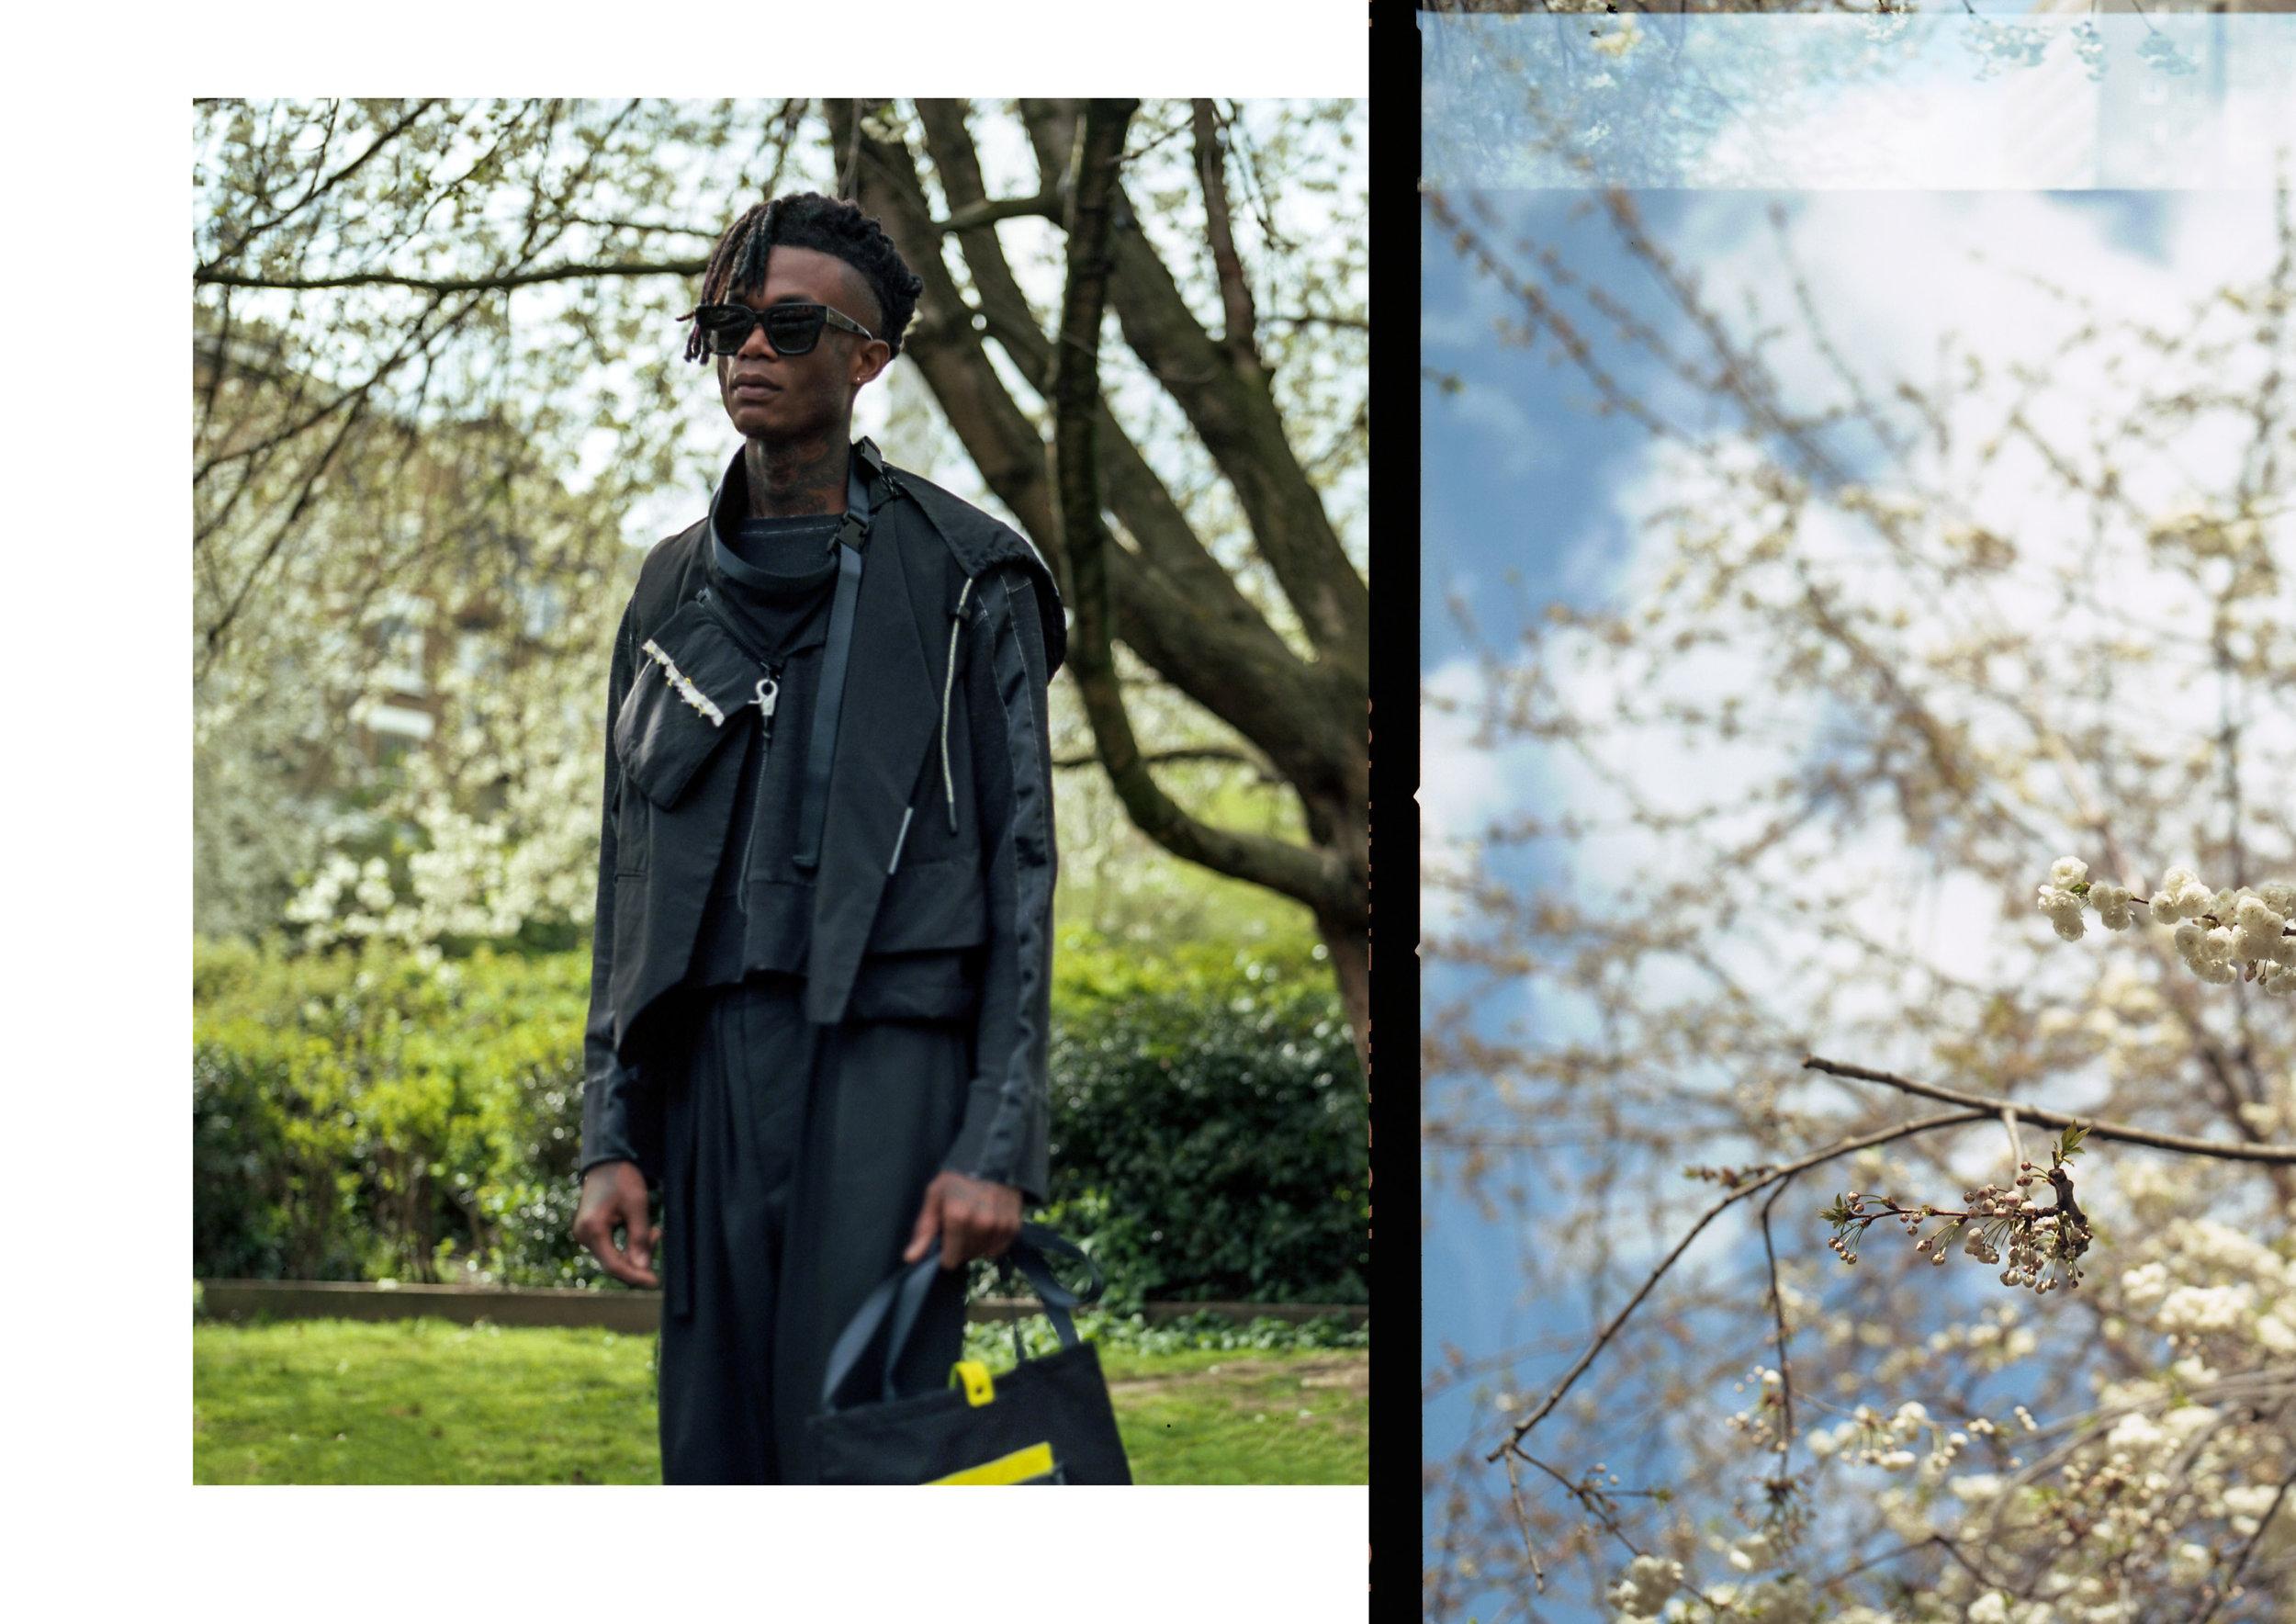 All clothes - Tourne de Transmission, Eyewear - Ace & Tate